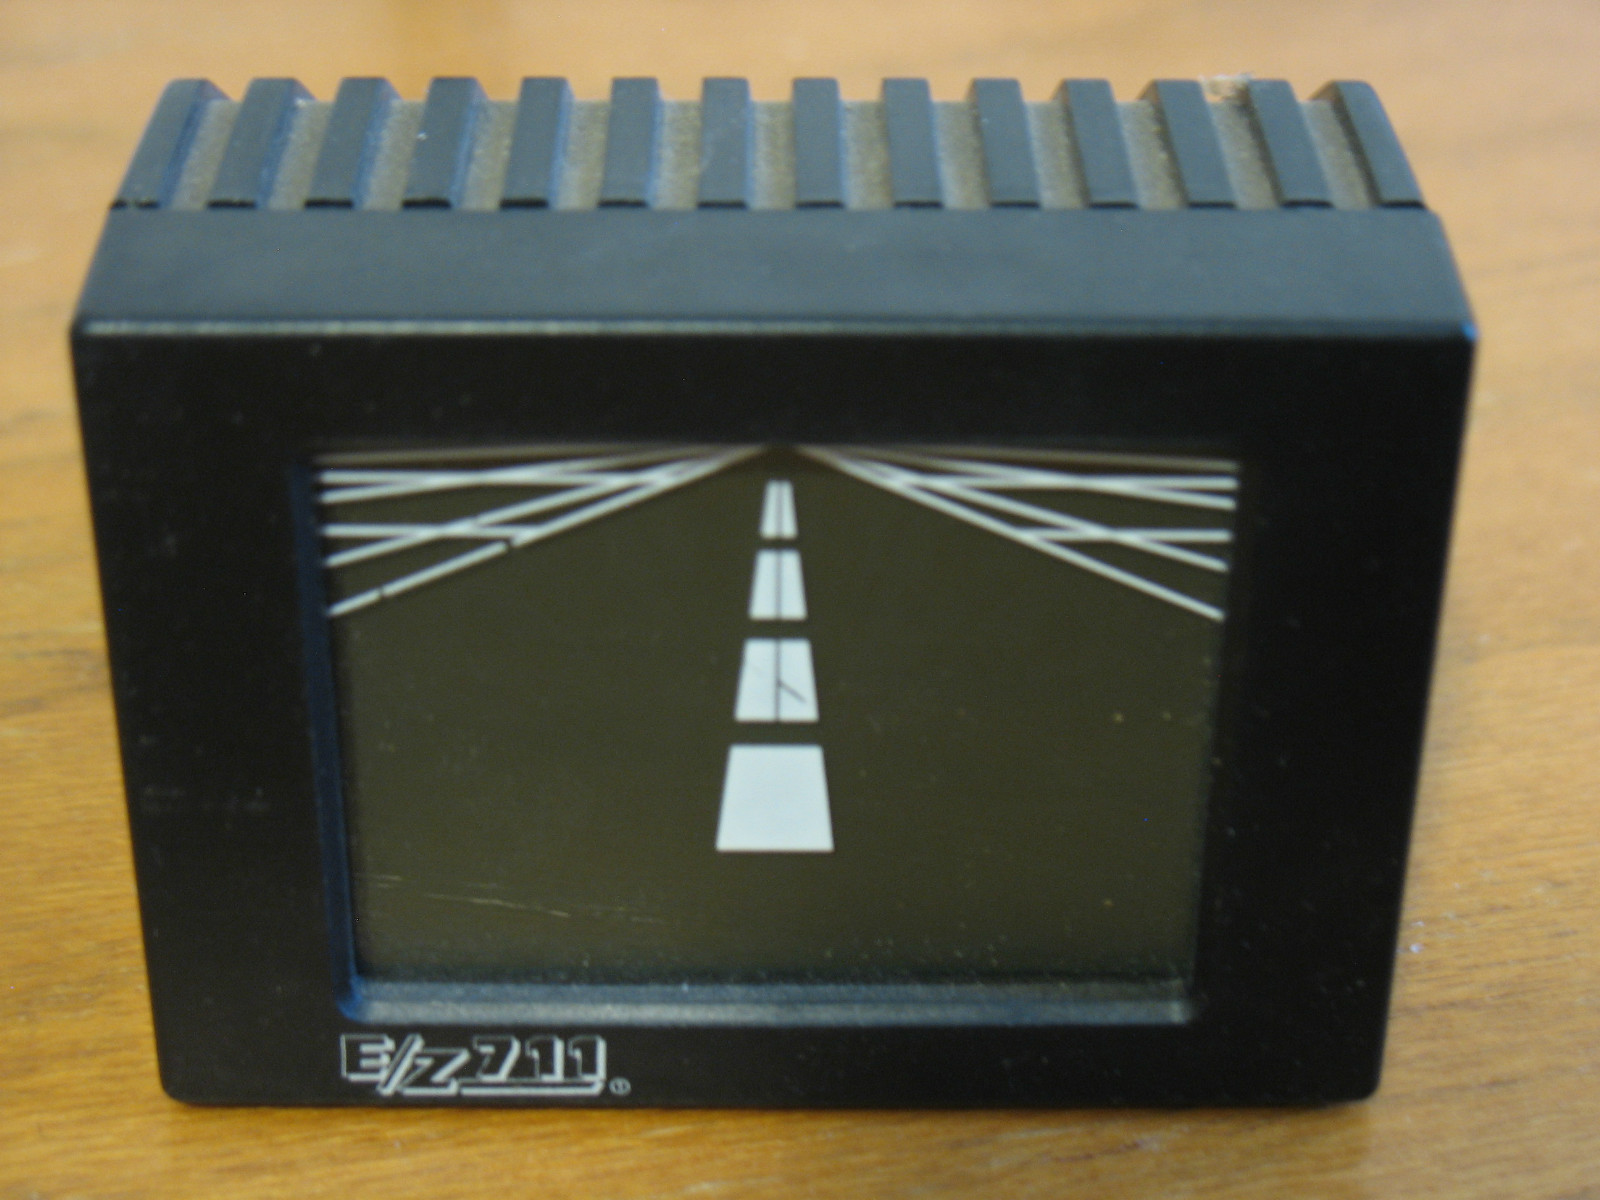 Click image for larger version  Name:zemco-ez711-compass.JPG Views:71 Size:336.6 KB ID:173050